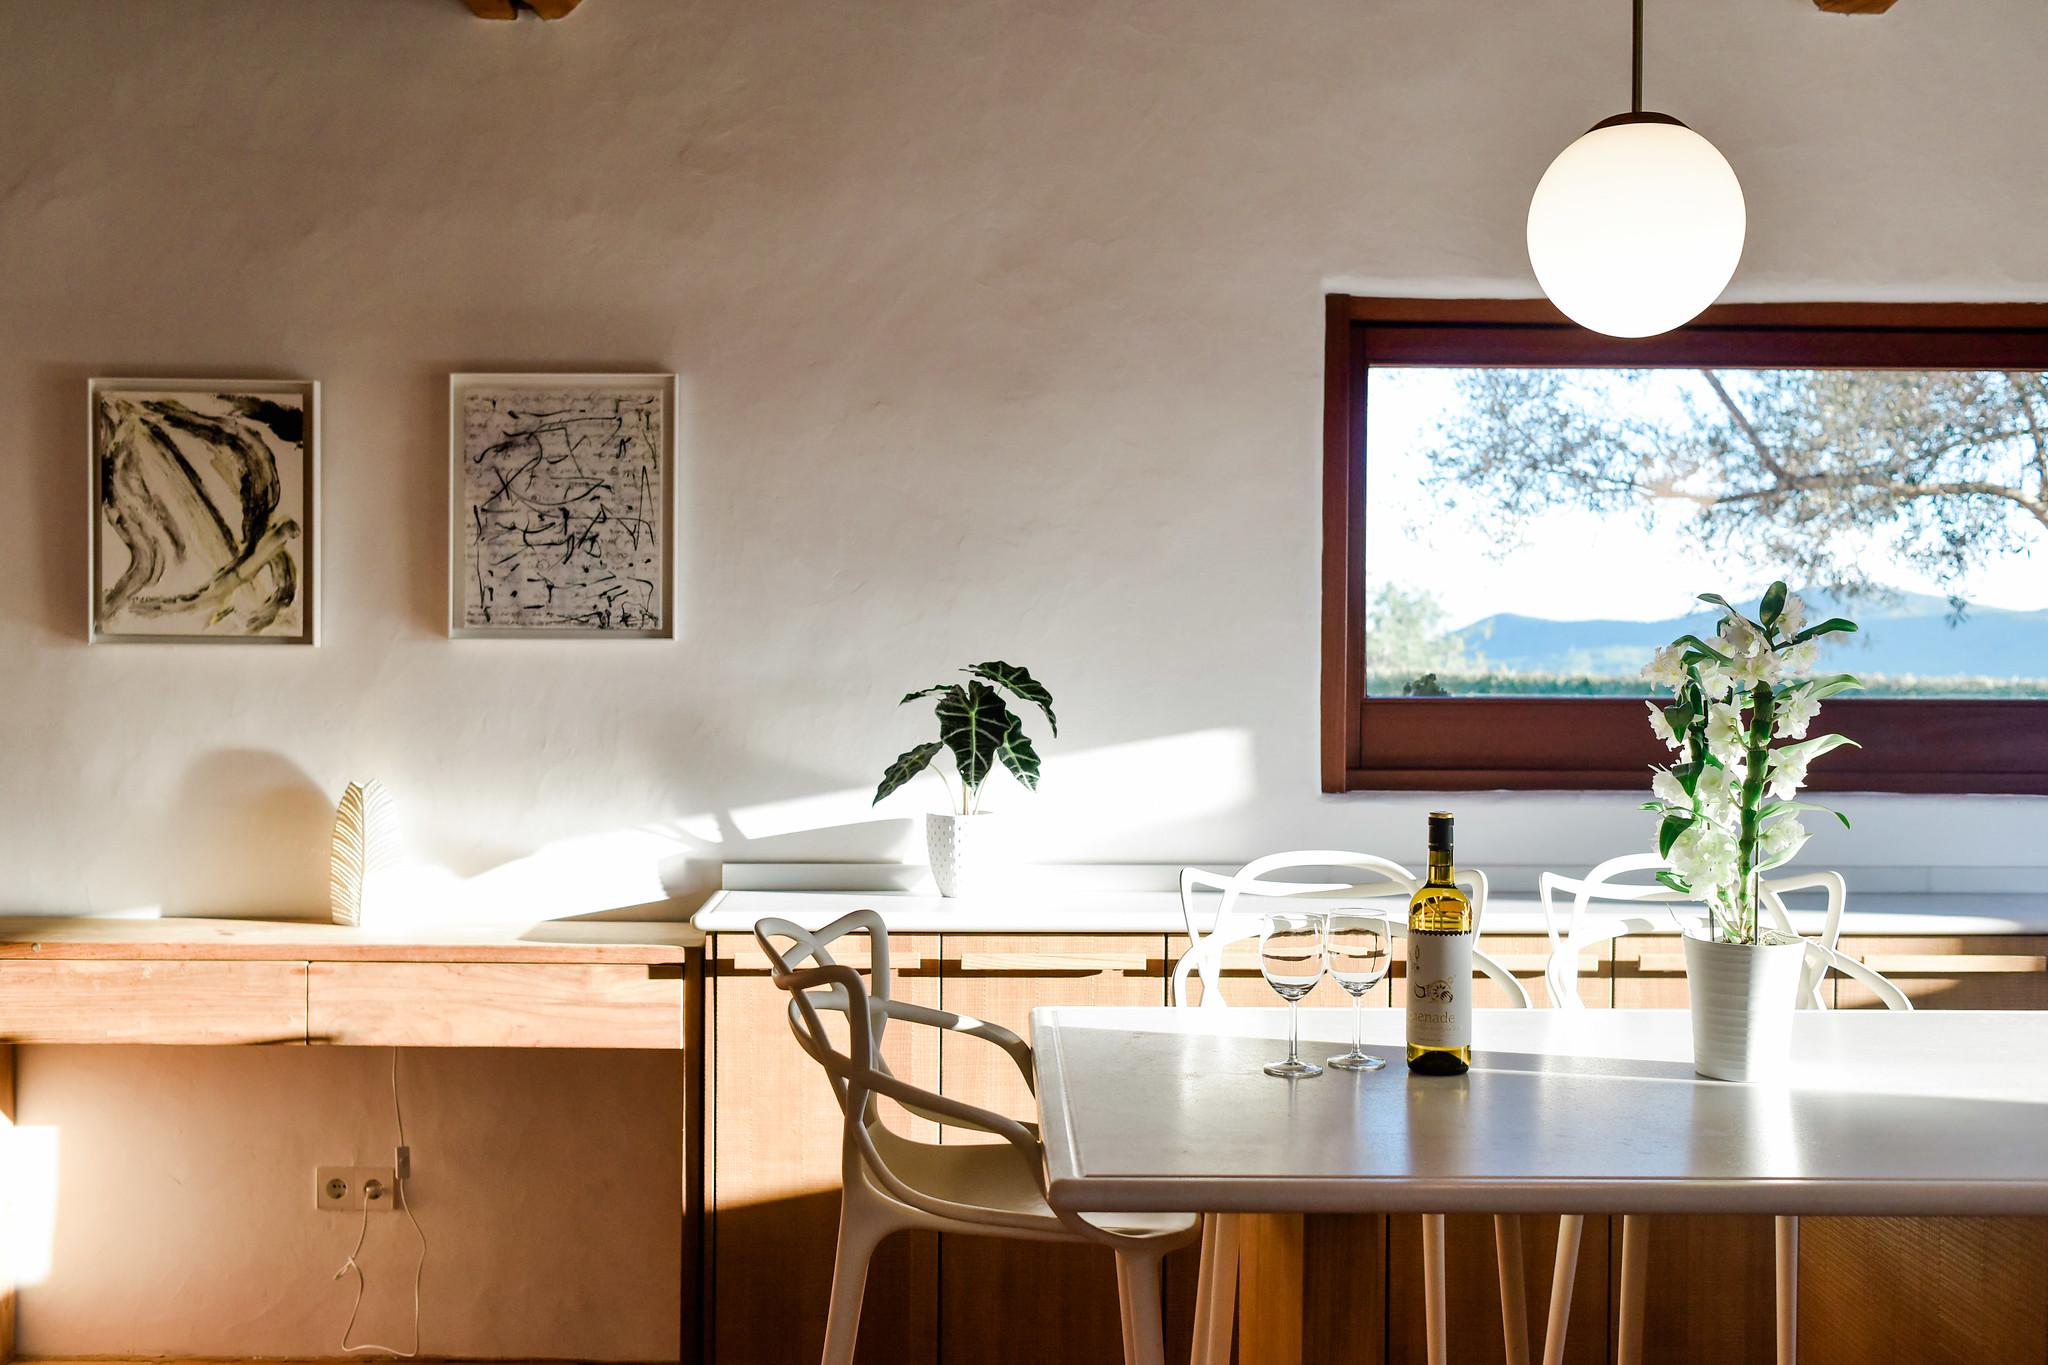 https://www.white-ibiza.com/wp-content/uploads/2020/05/white-ibiza-villas-can-lavanda-kitchen.jpg